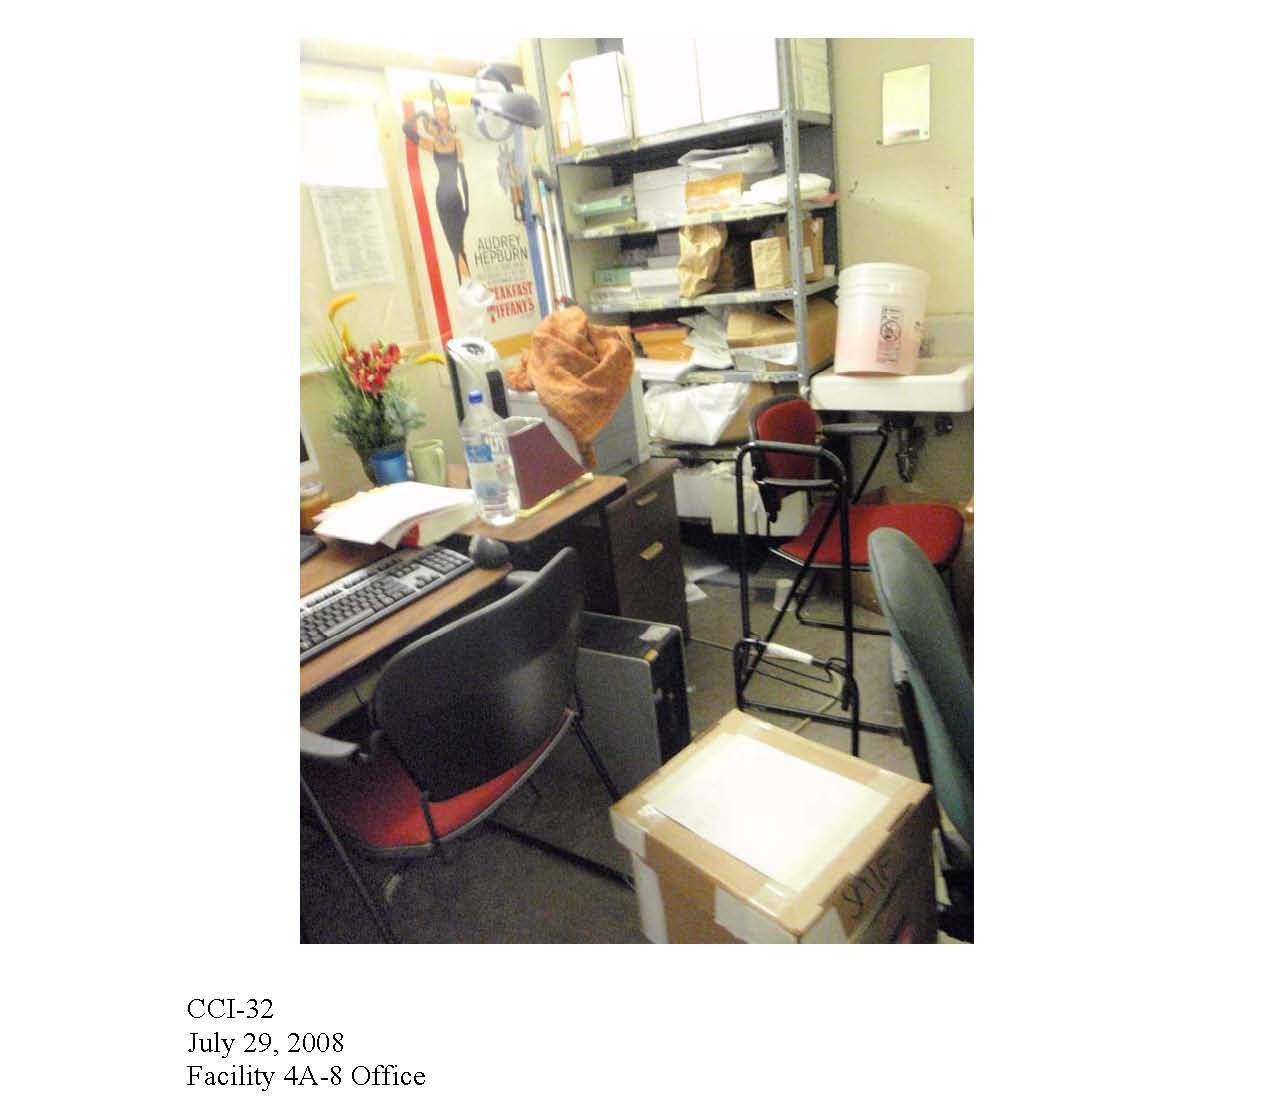 P-337-CCI-32-Facility-4A-8-Office